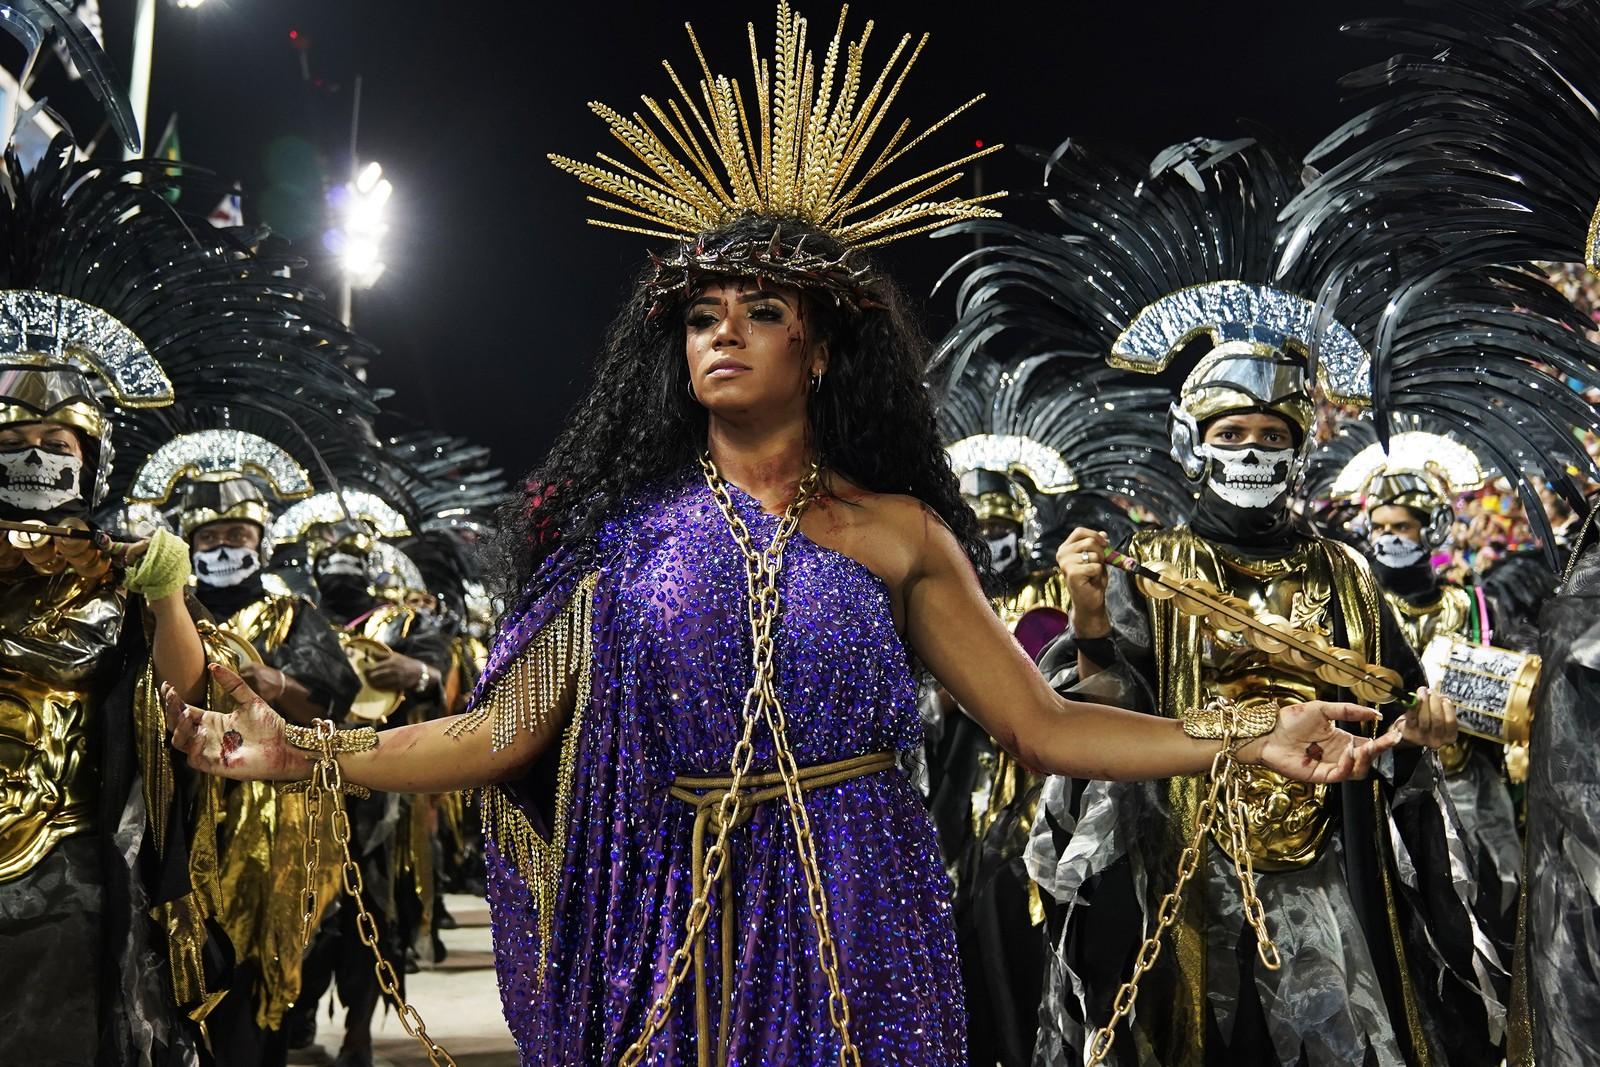 Evelyn Bastos, representando Jesus, durante desfile da Mngueira